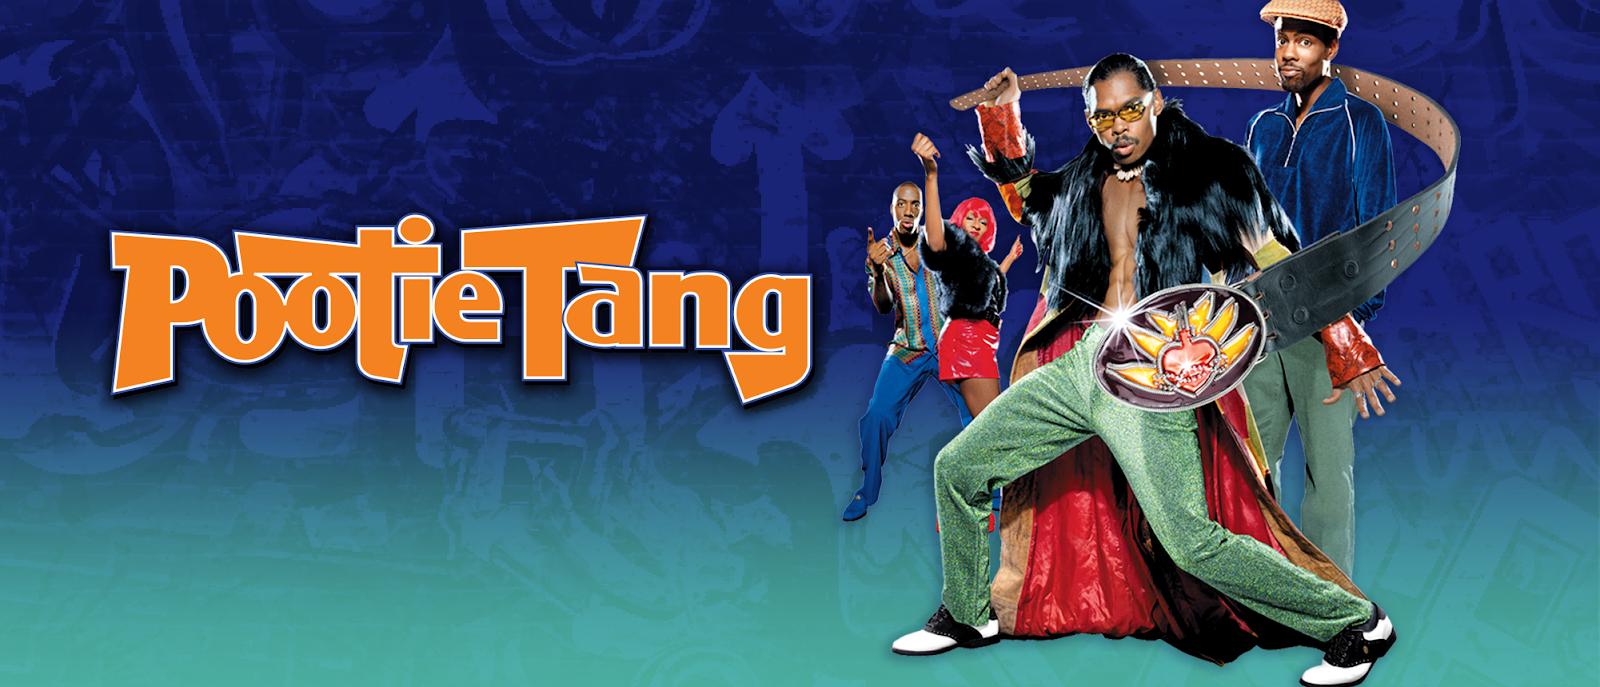 Hero-Pootie Tang.png